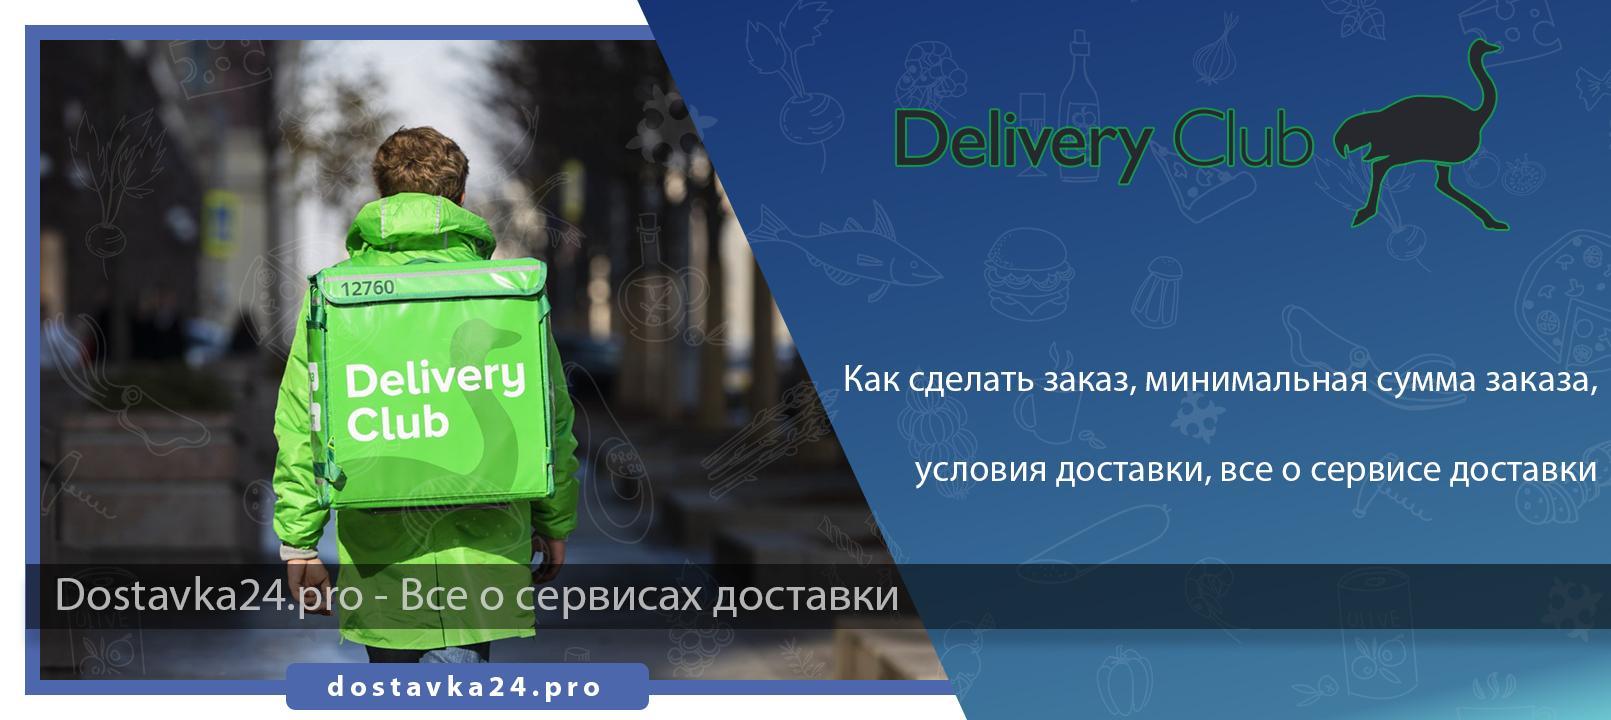 Delivery club сервис доставки